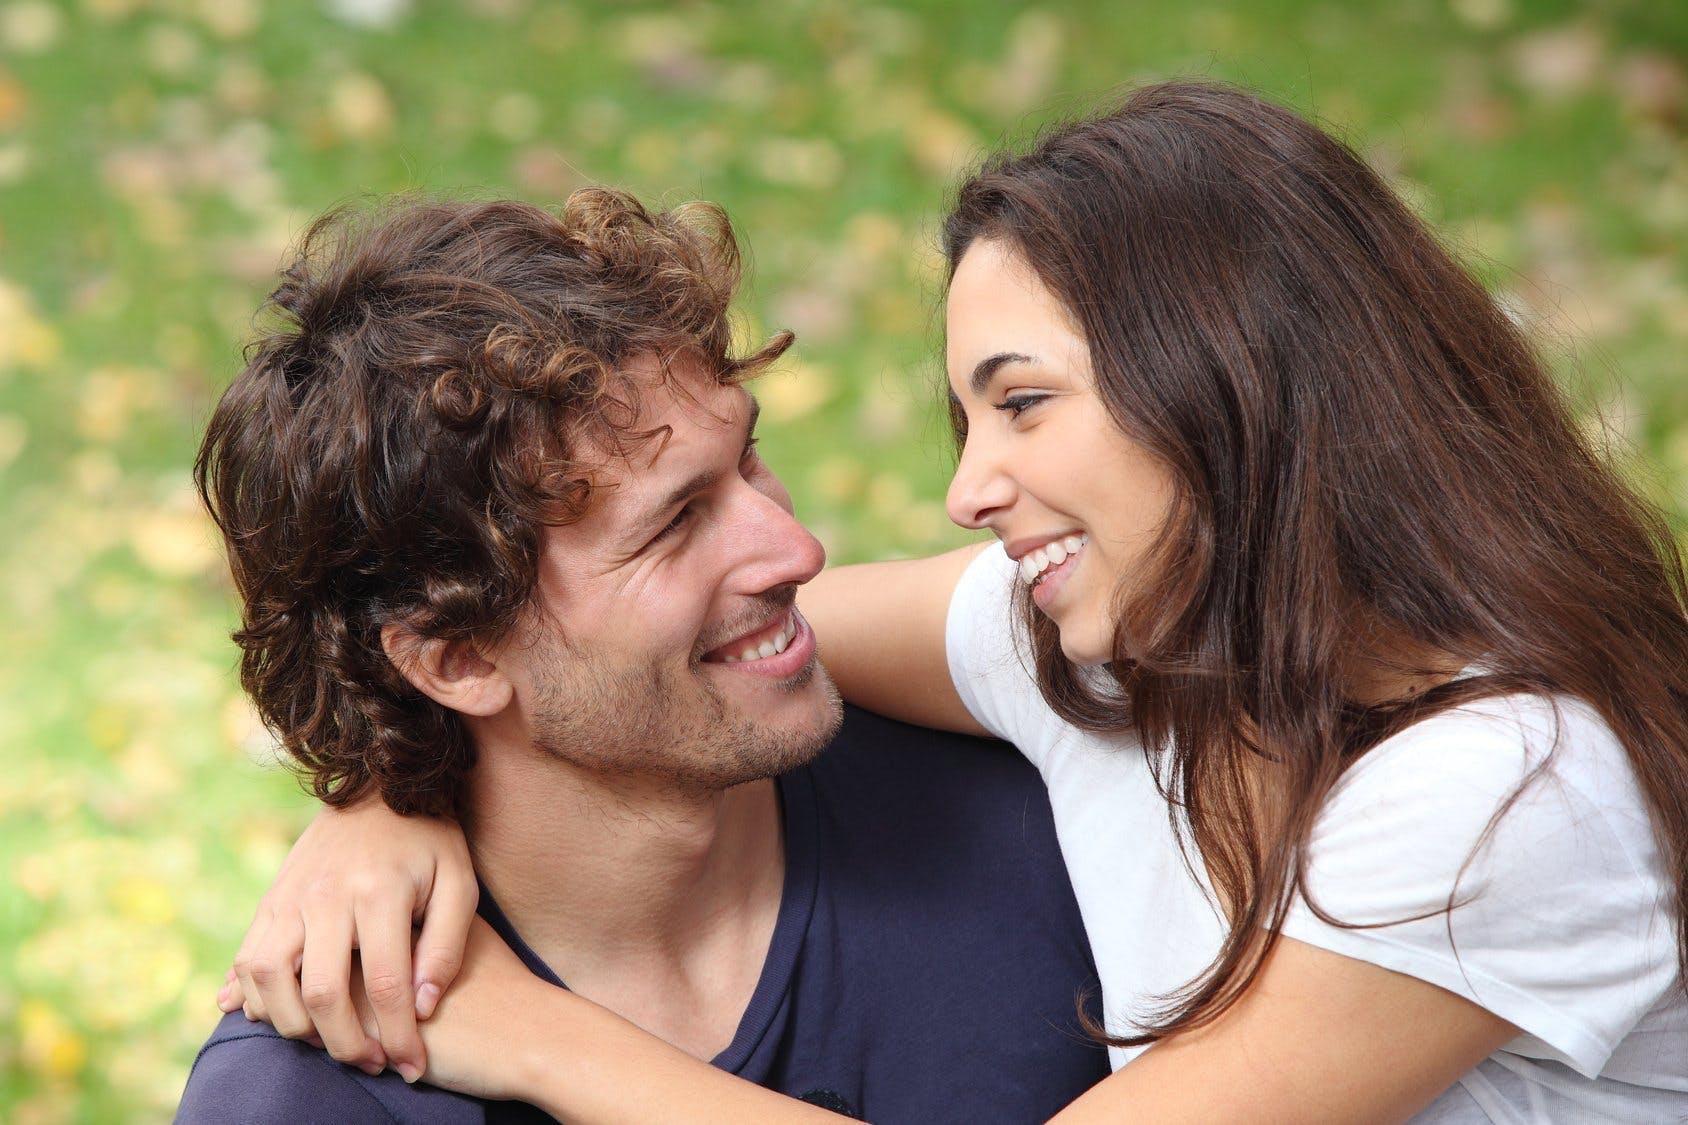 nieśmiali faceci randki online